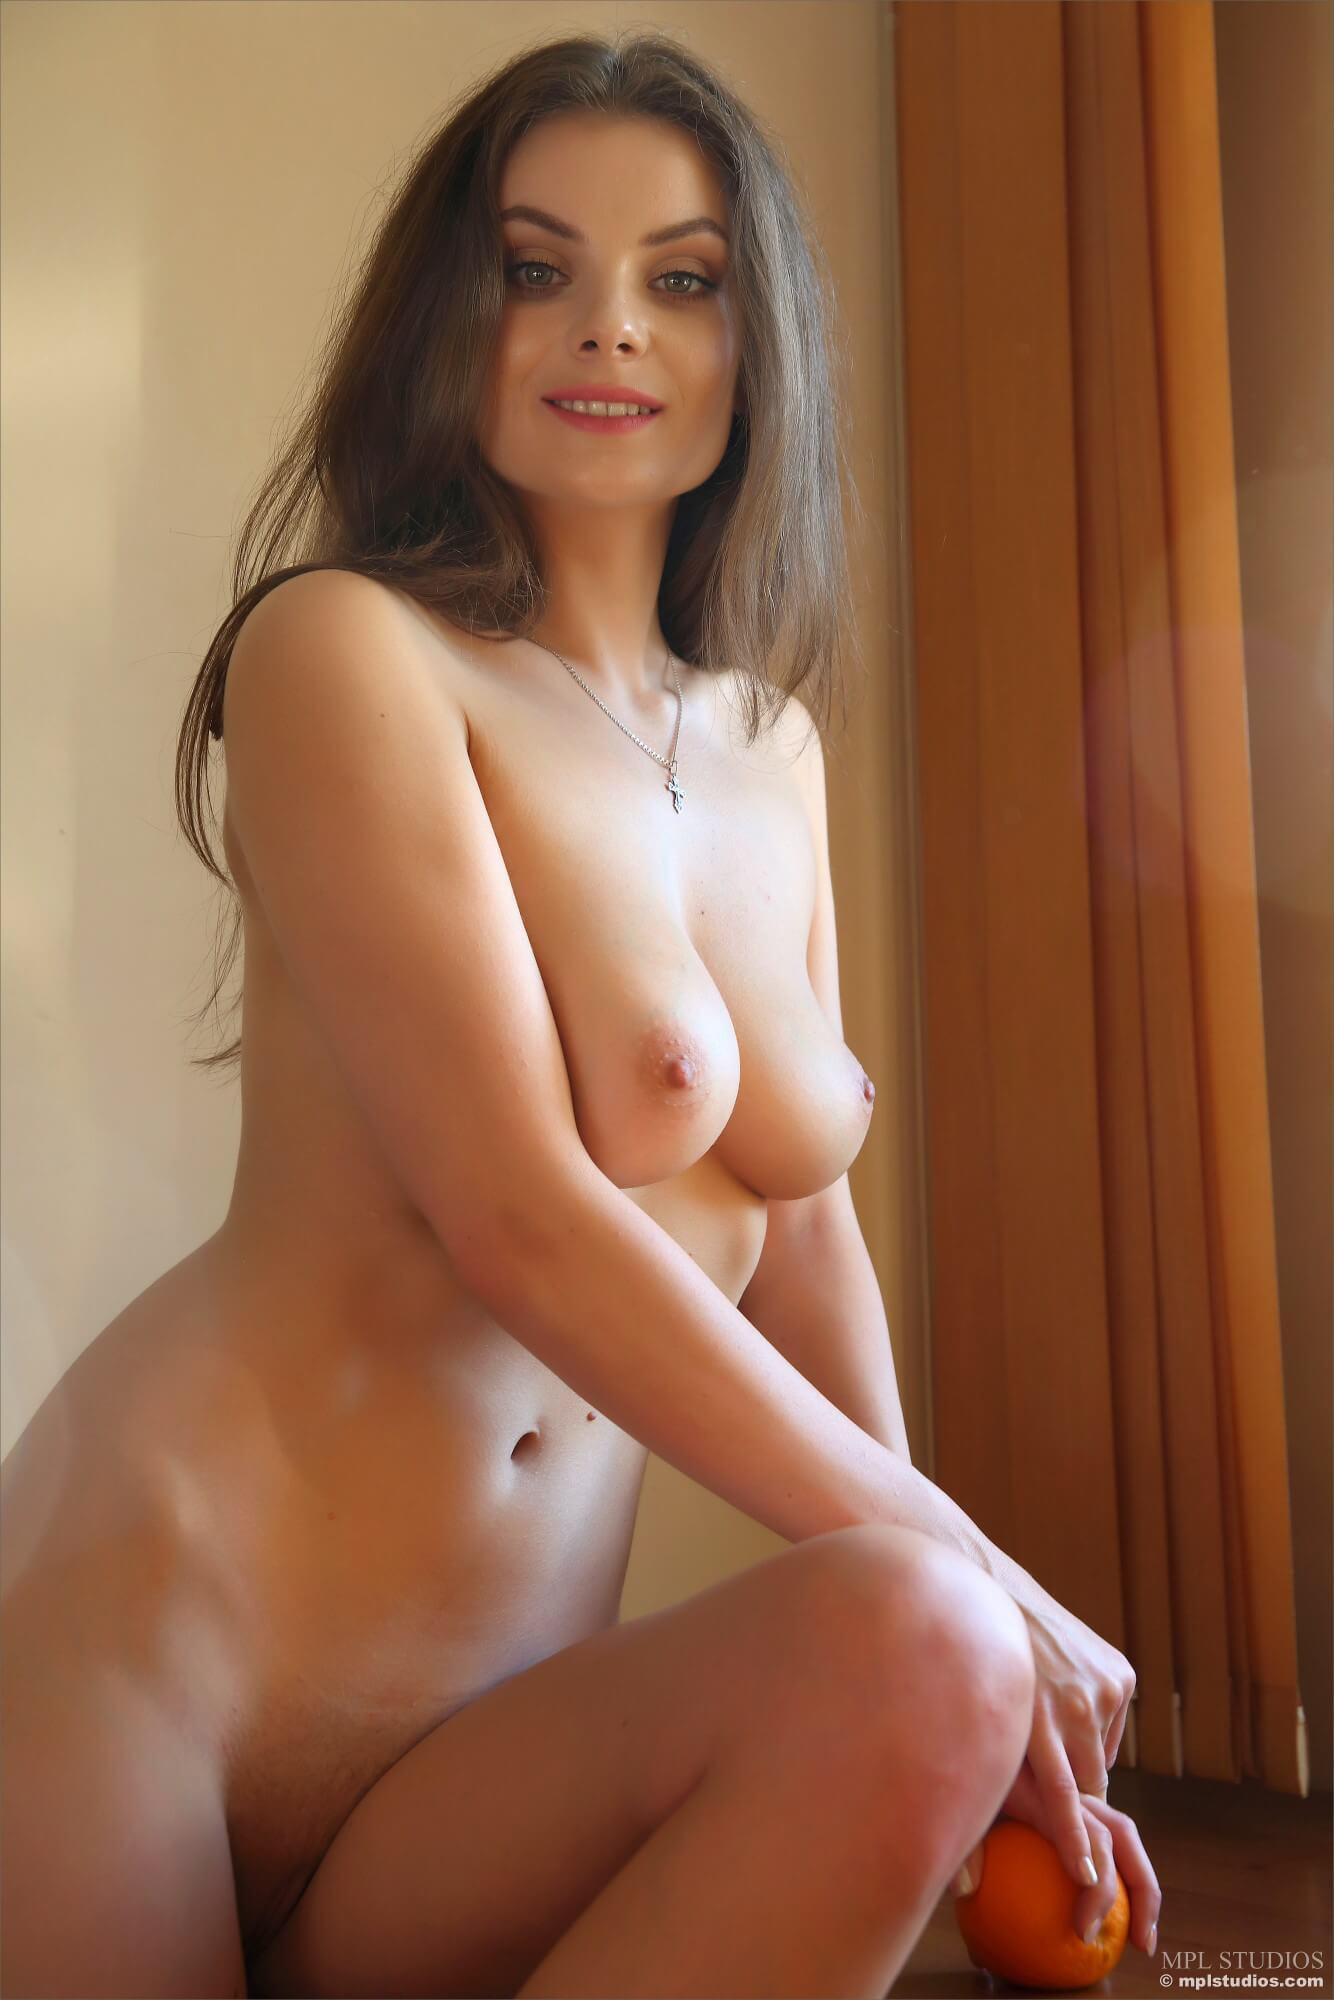 MPLStudios model Keisha nude